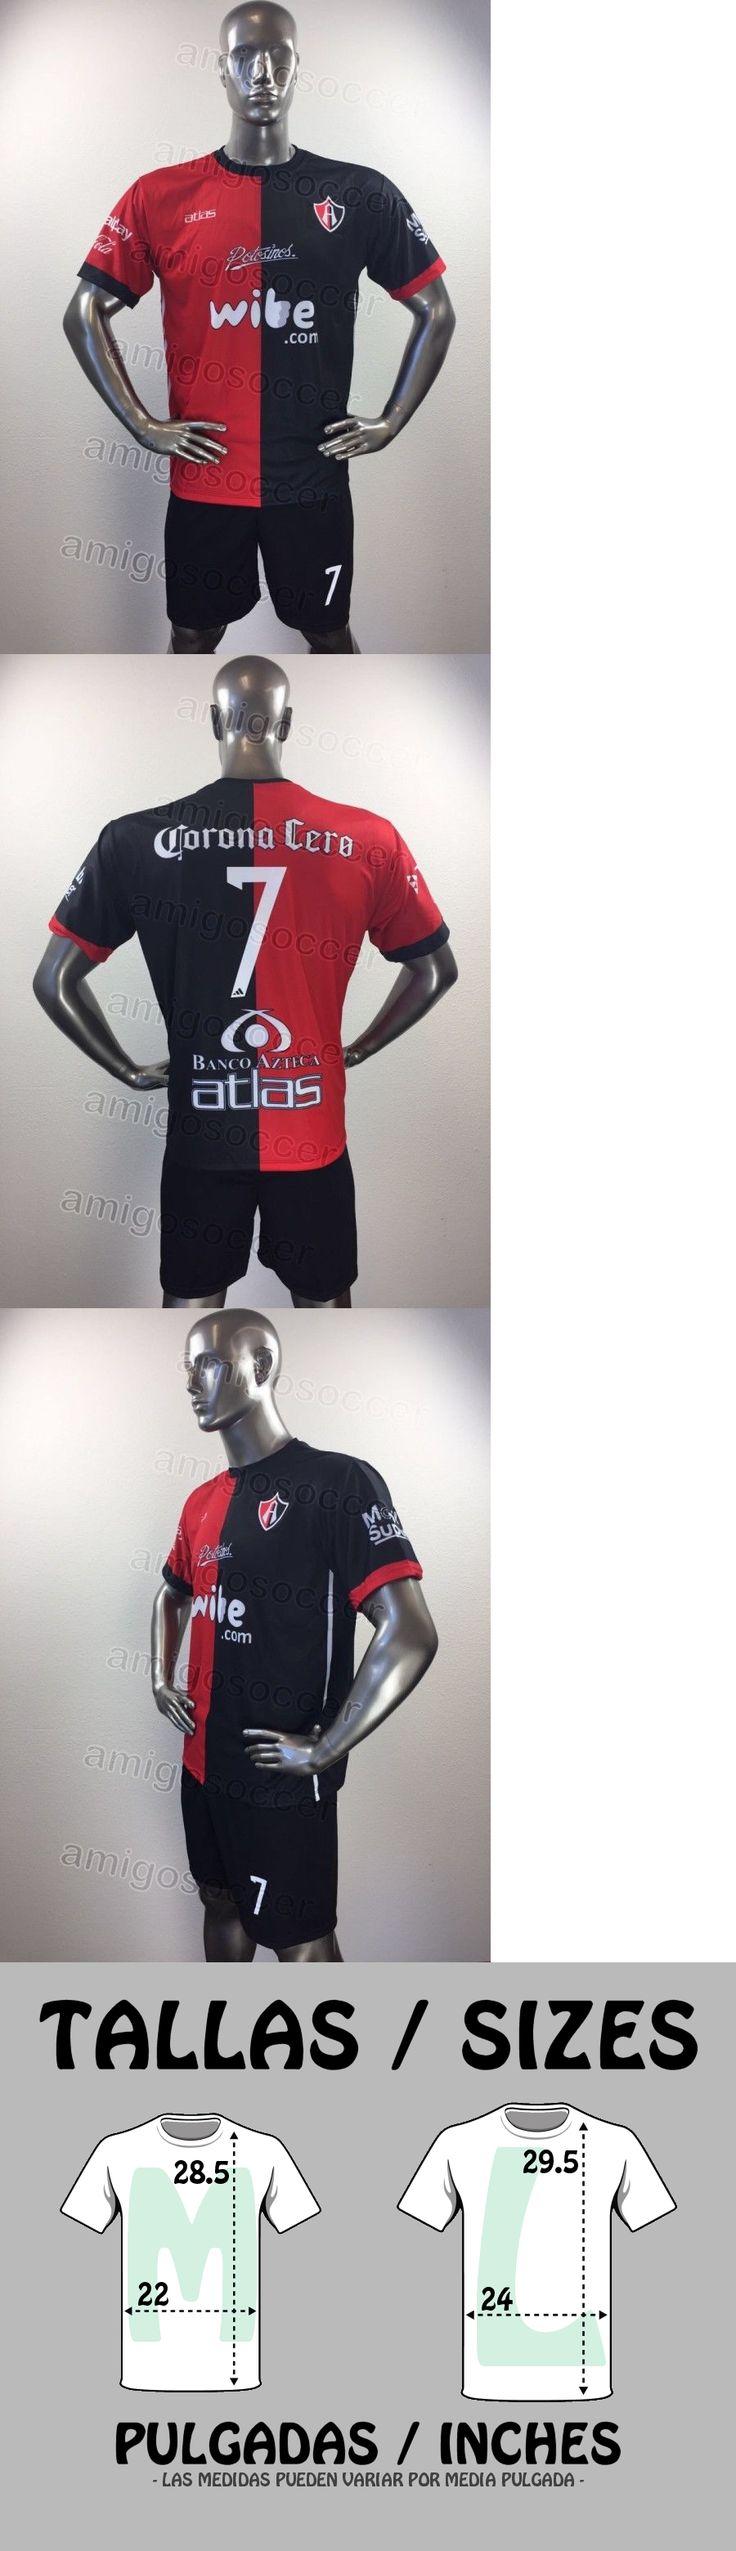 Men 123490: 19 Atlas Home (1M 18L) Soccer Uniforms - Uniformes De Futbol -> BUY IT NOW ONLY: $380 on eBay!